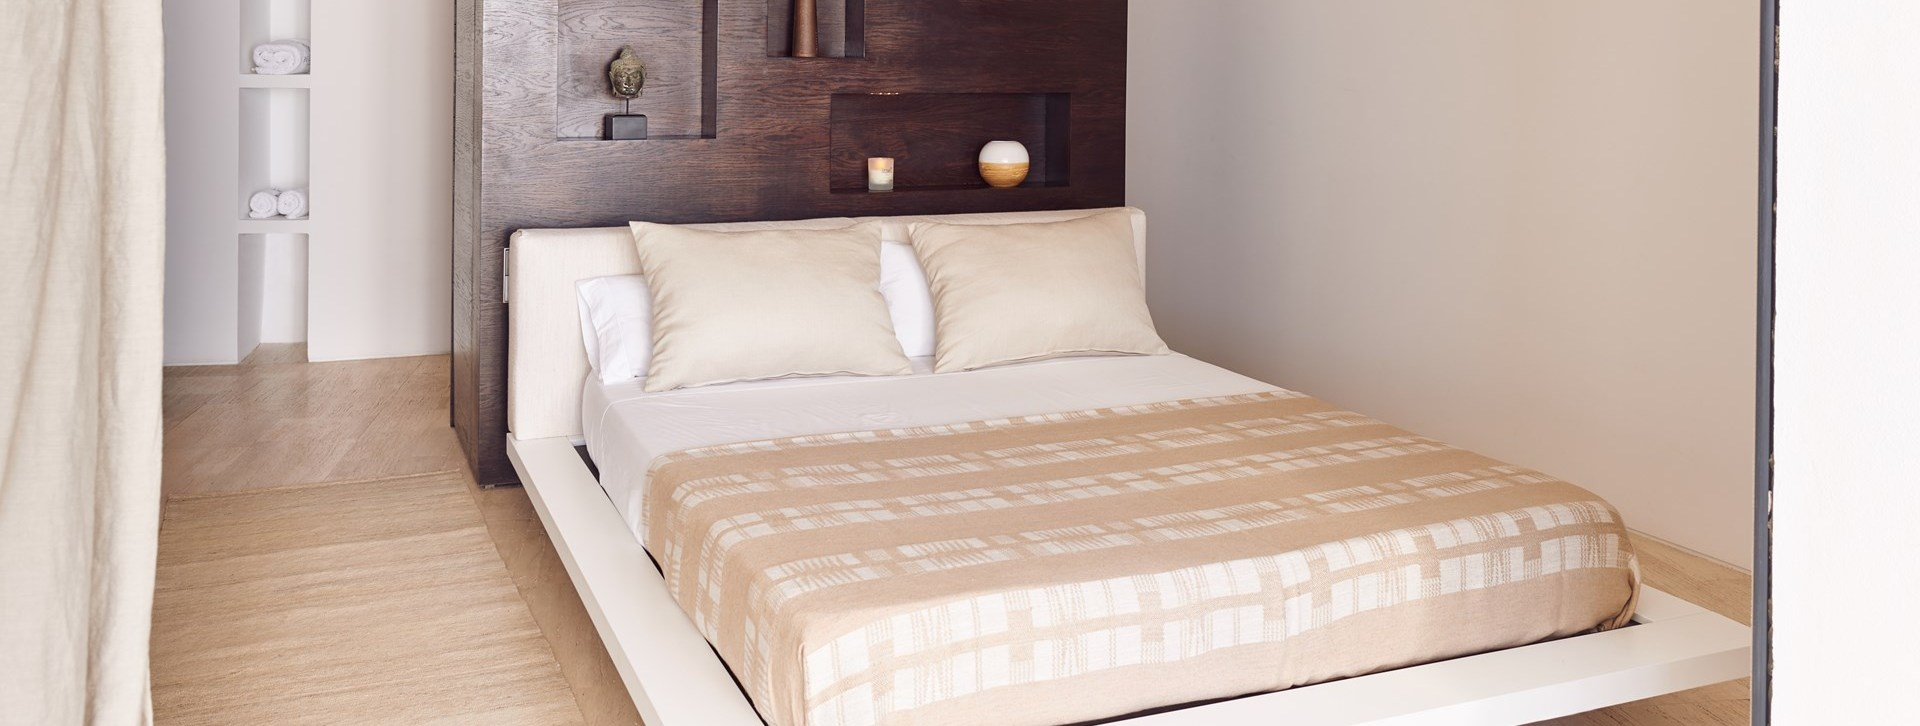 villa-can-castello-double-bedroom4